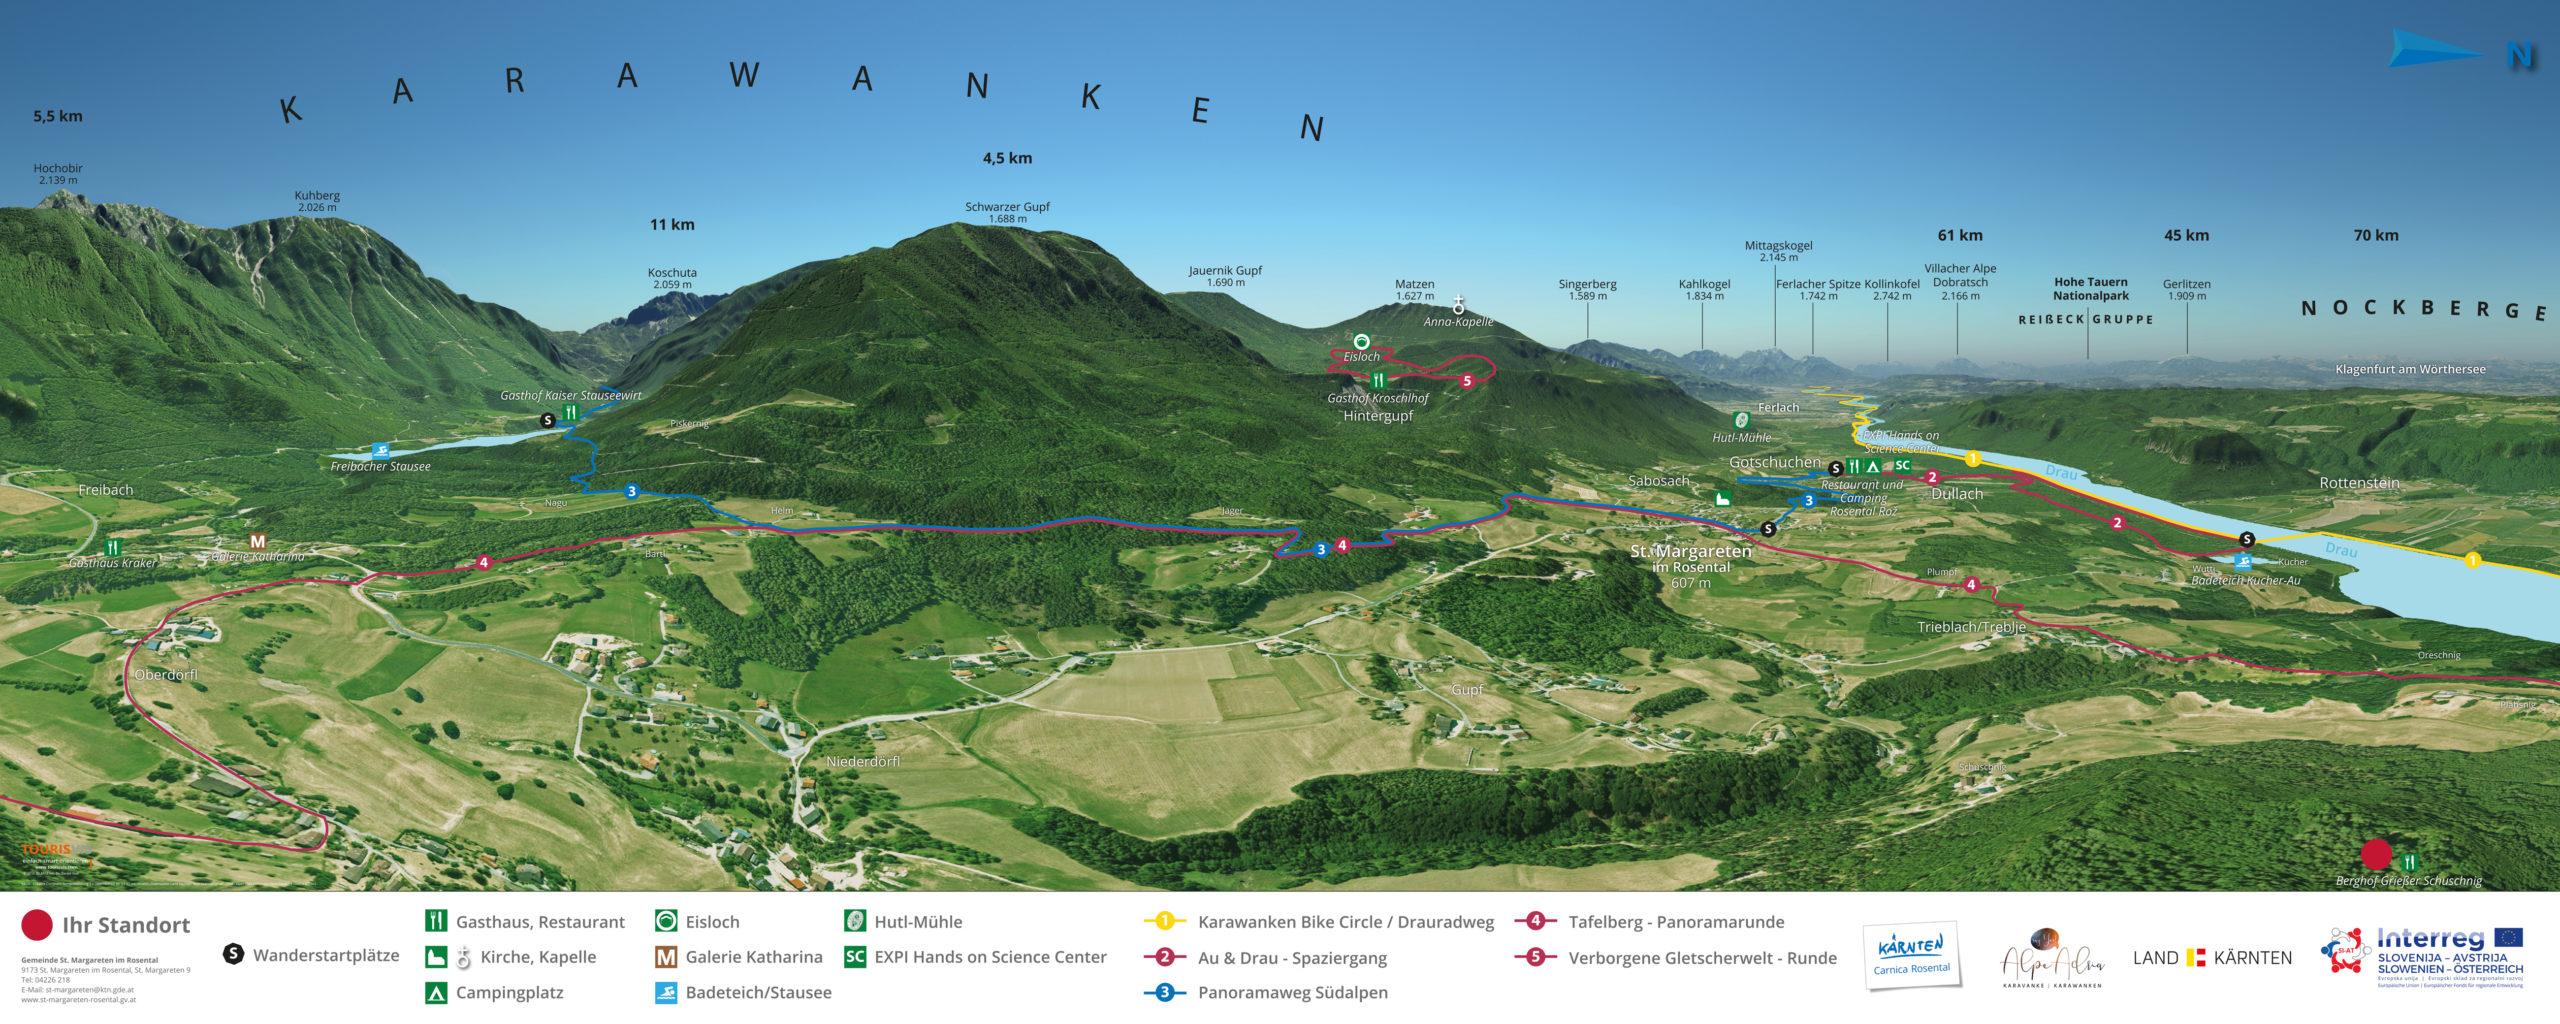 3D Gipfelpanorama wandern Carnica Sankt Margarethen Rosental Kaernten